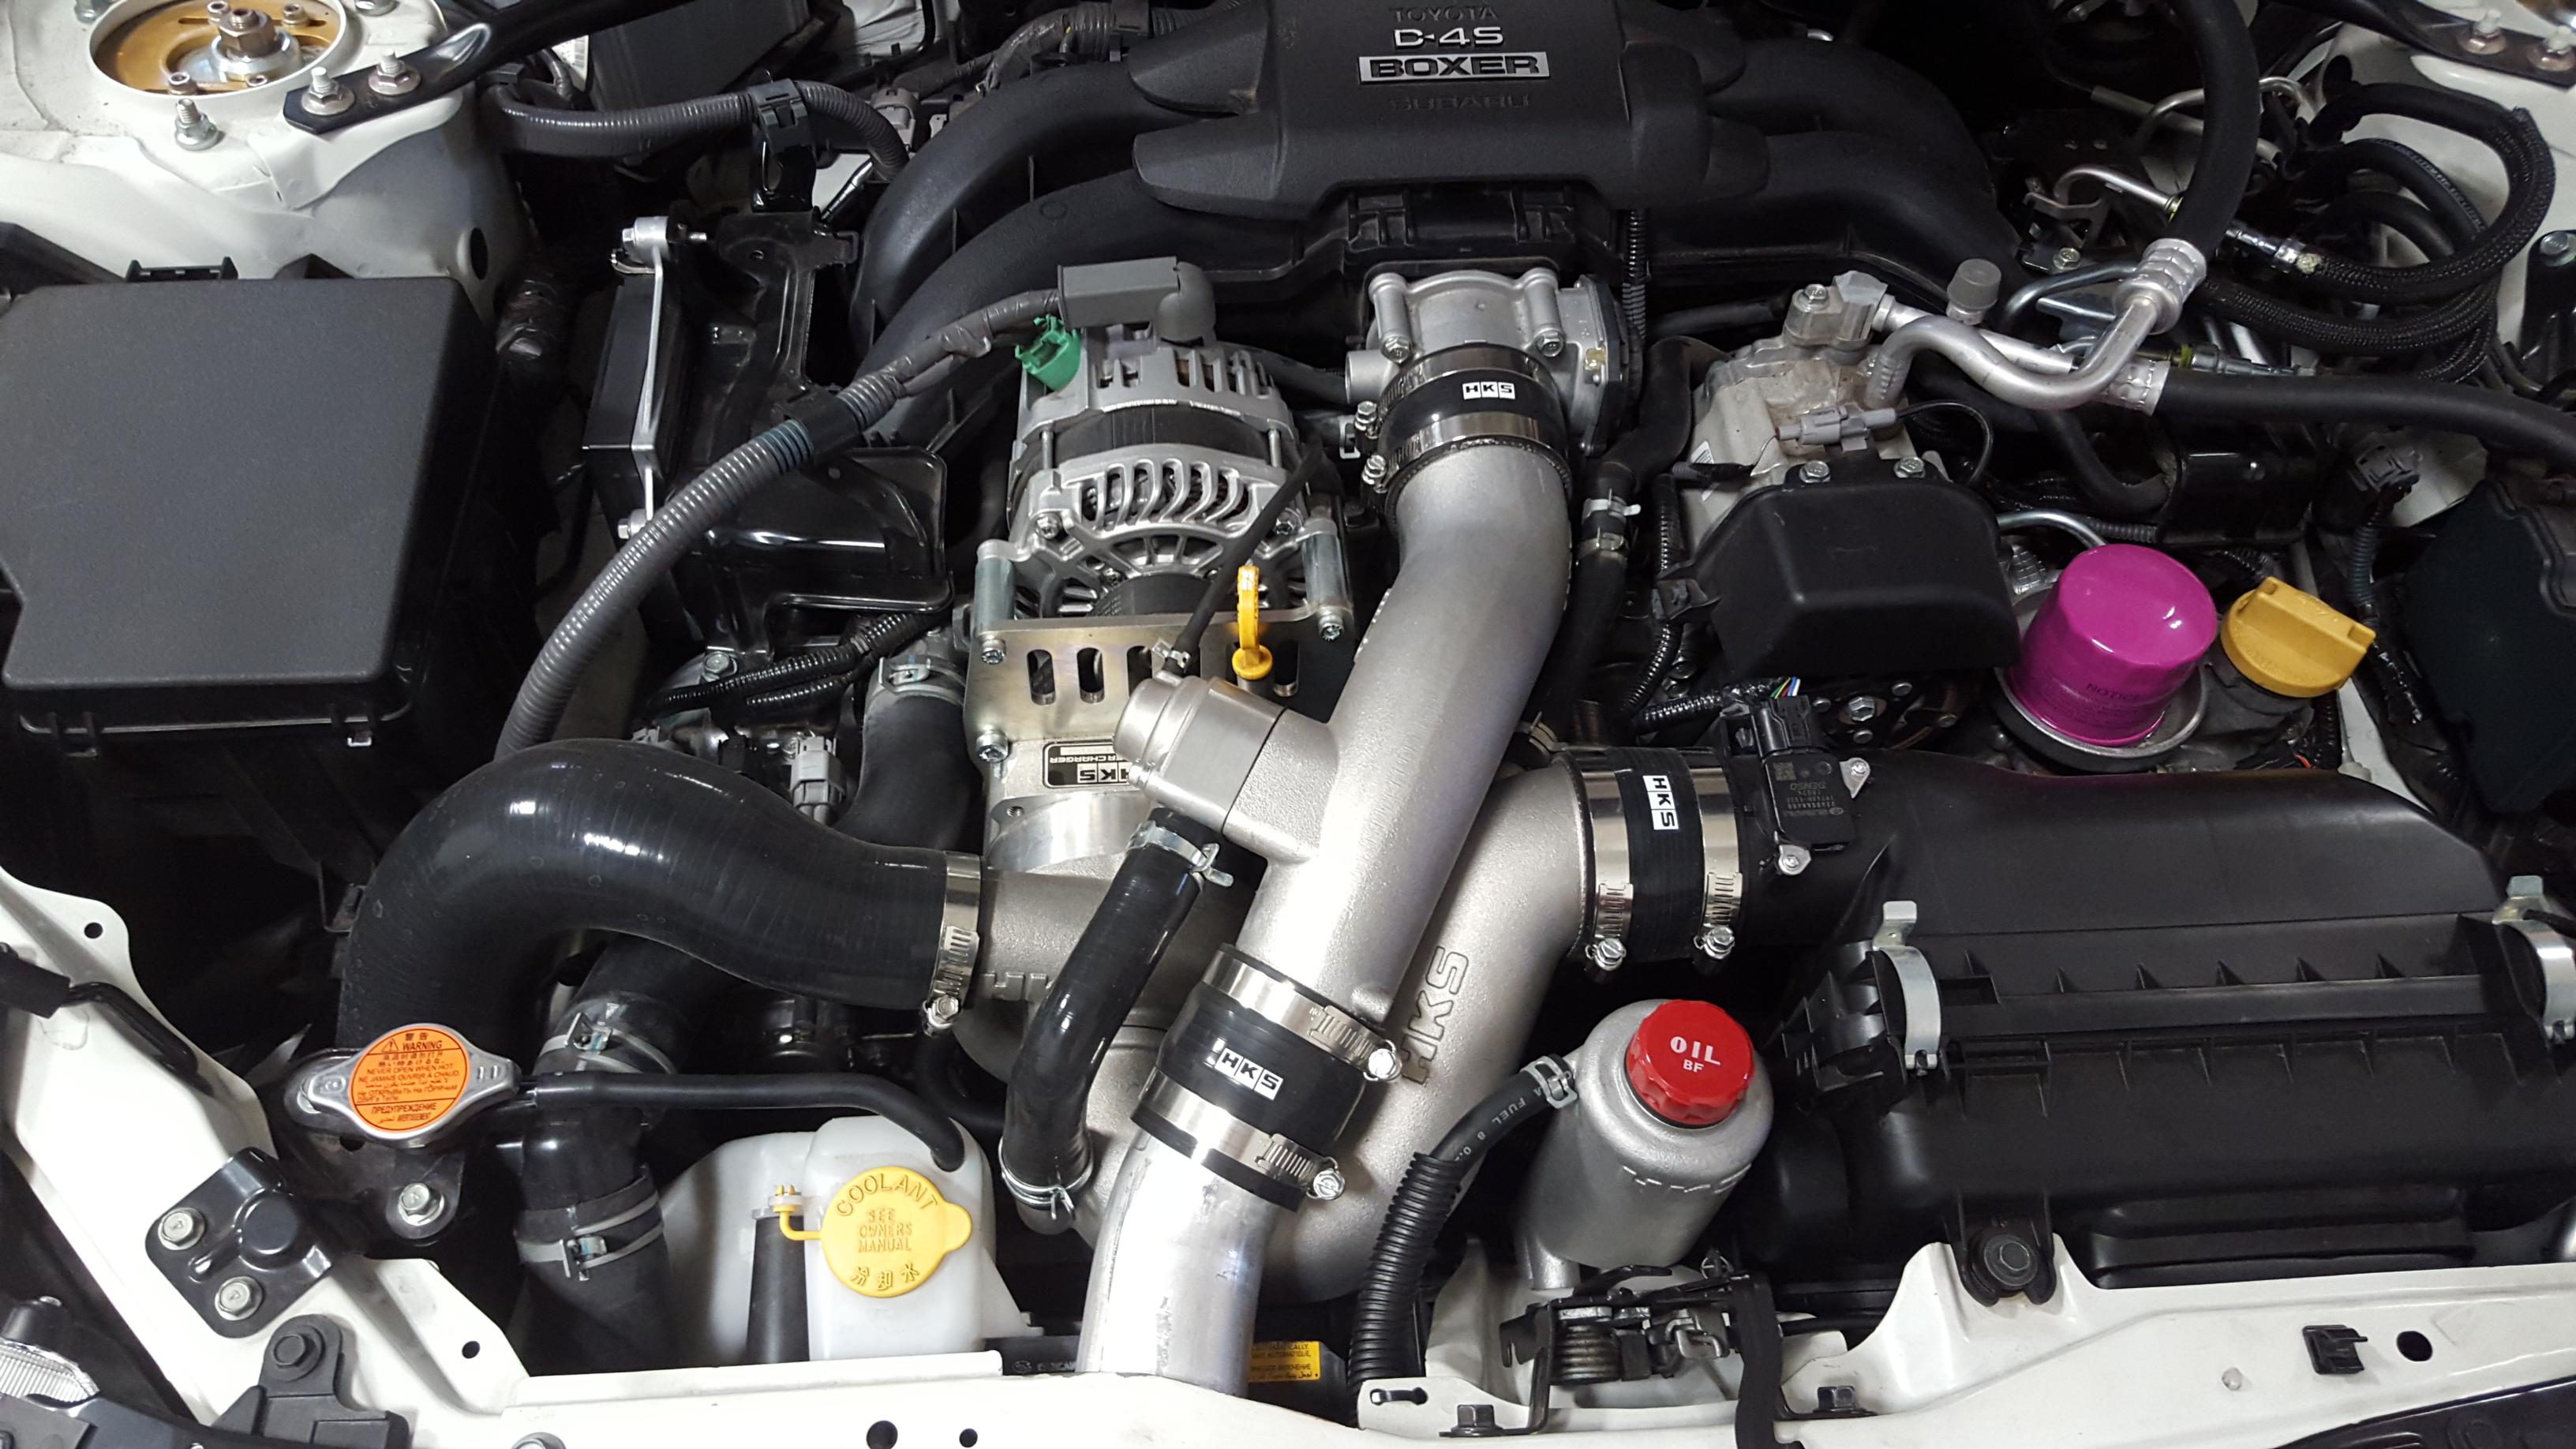 Evasive Motorsports Ph 6263363400 Mon Fri 9am 6pm Pst Hks Gt Subaru Impreza Wrx Intake Amp Exhaust Diagram The Official Blog Of Supercharger System Pro Ecu Package Version 3 Scion Frs Brz